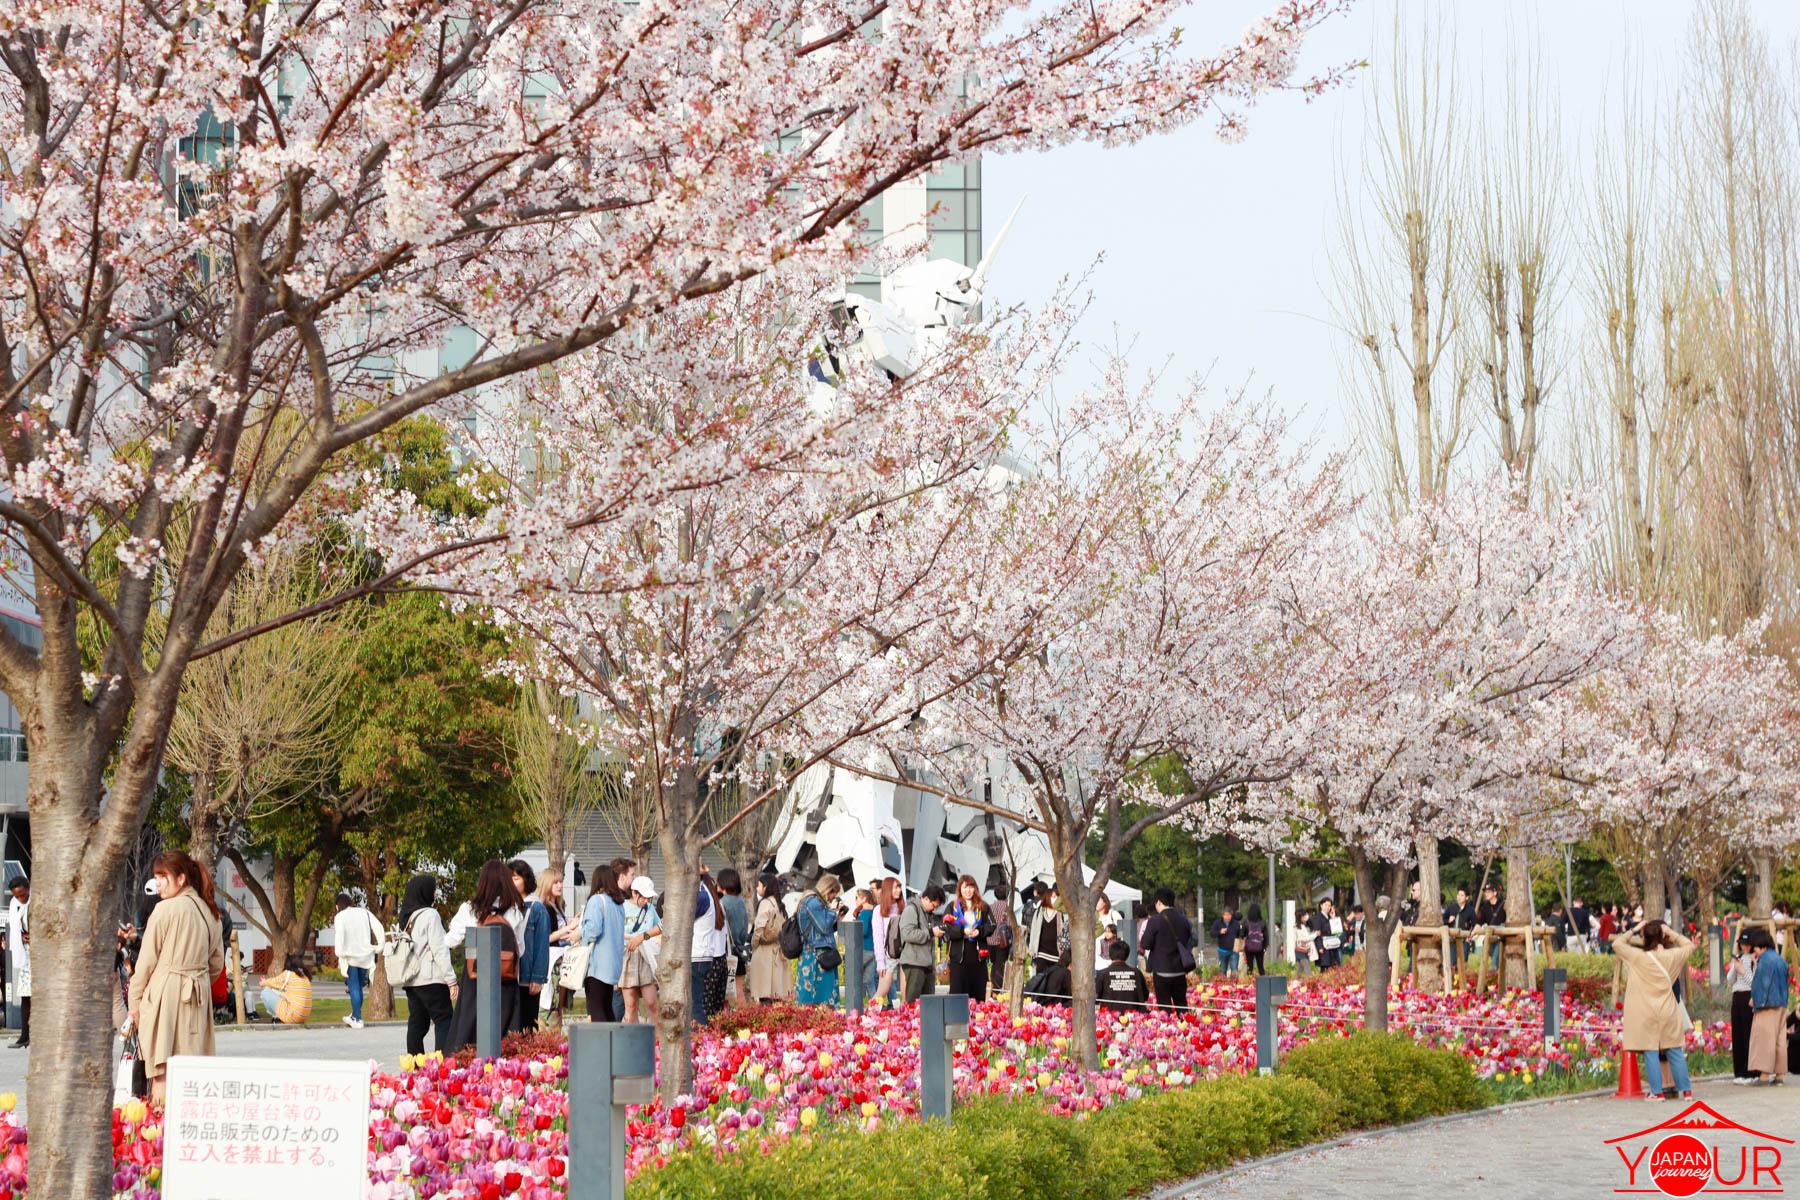 Japan Cherry Blossom Forecast 2019 - Gundam Unicorn Odaiba